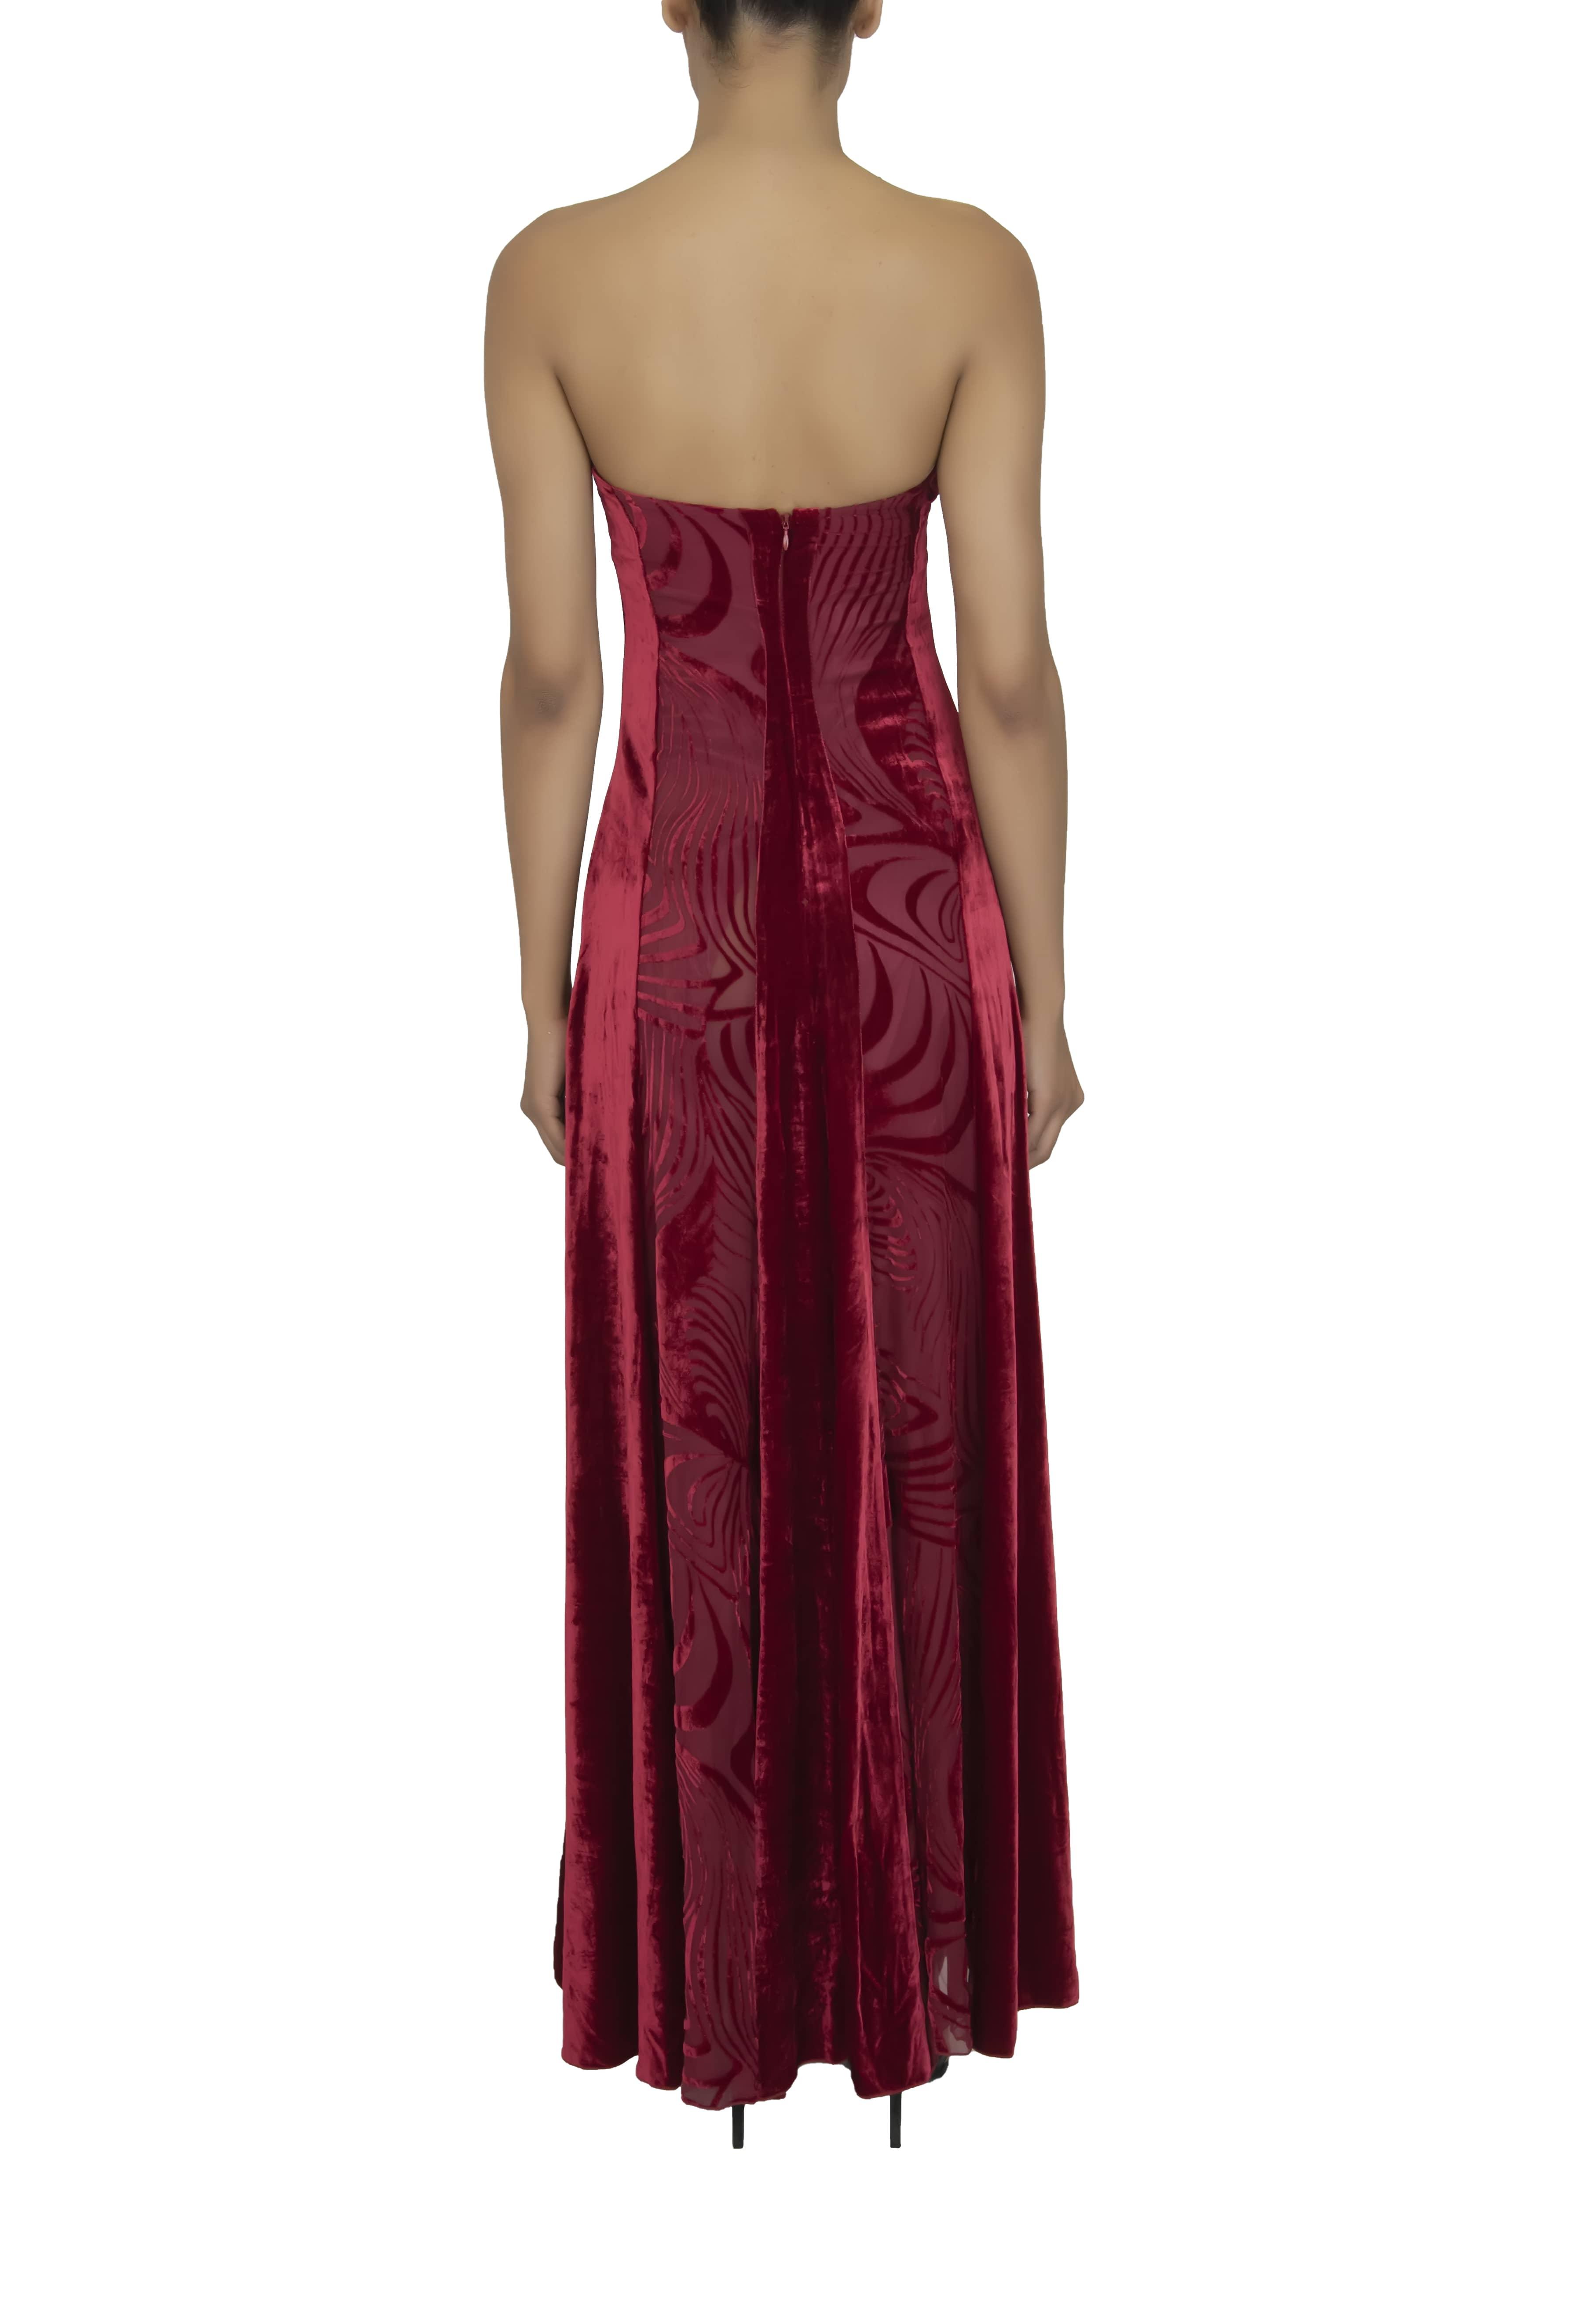 Dress FULU 2